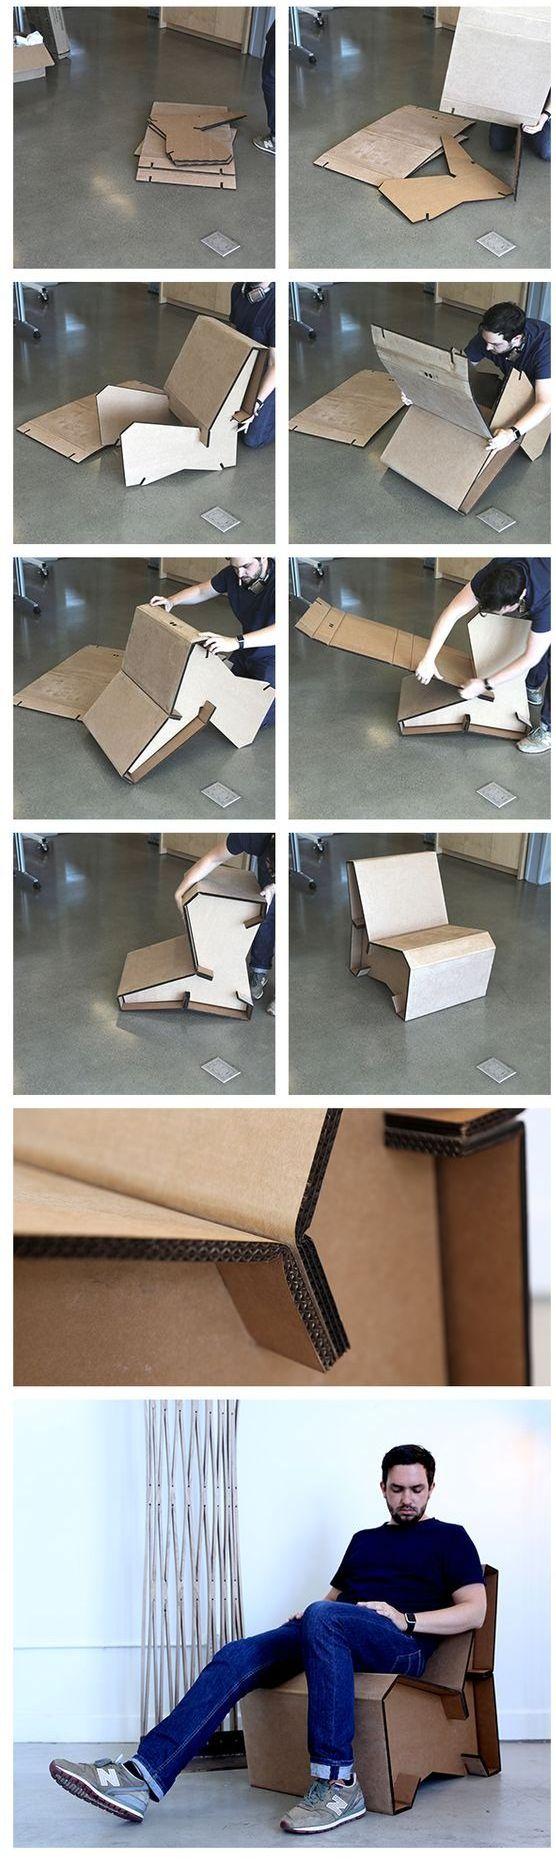 кресло и стул схема из бумаги и картона